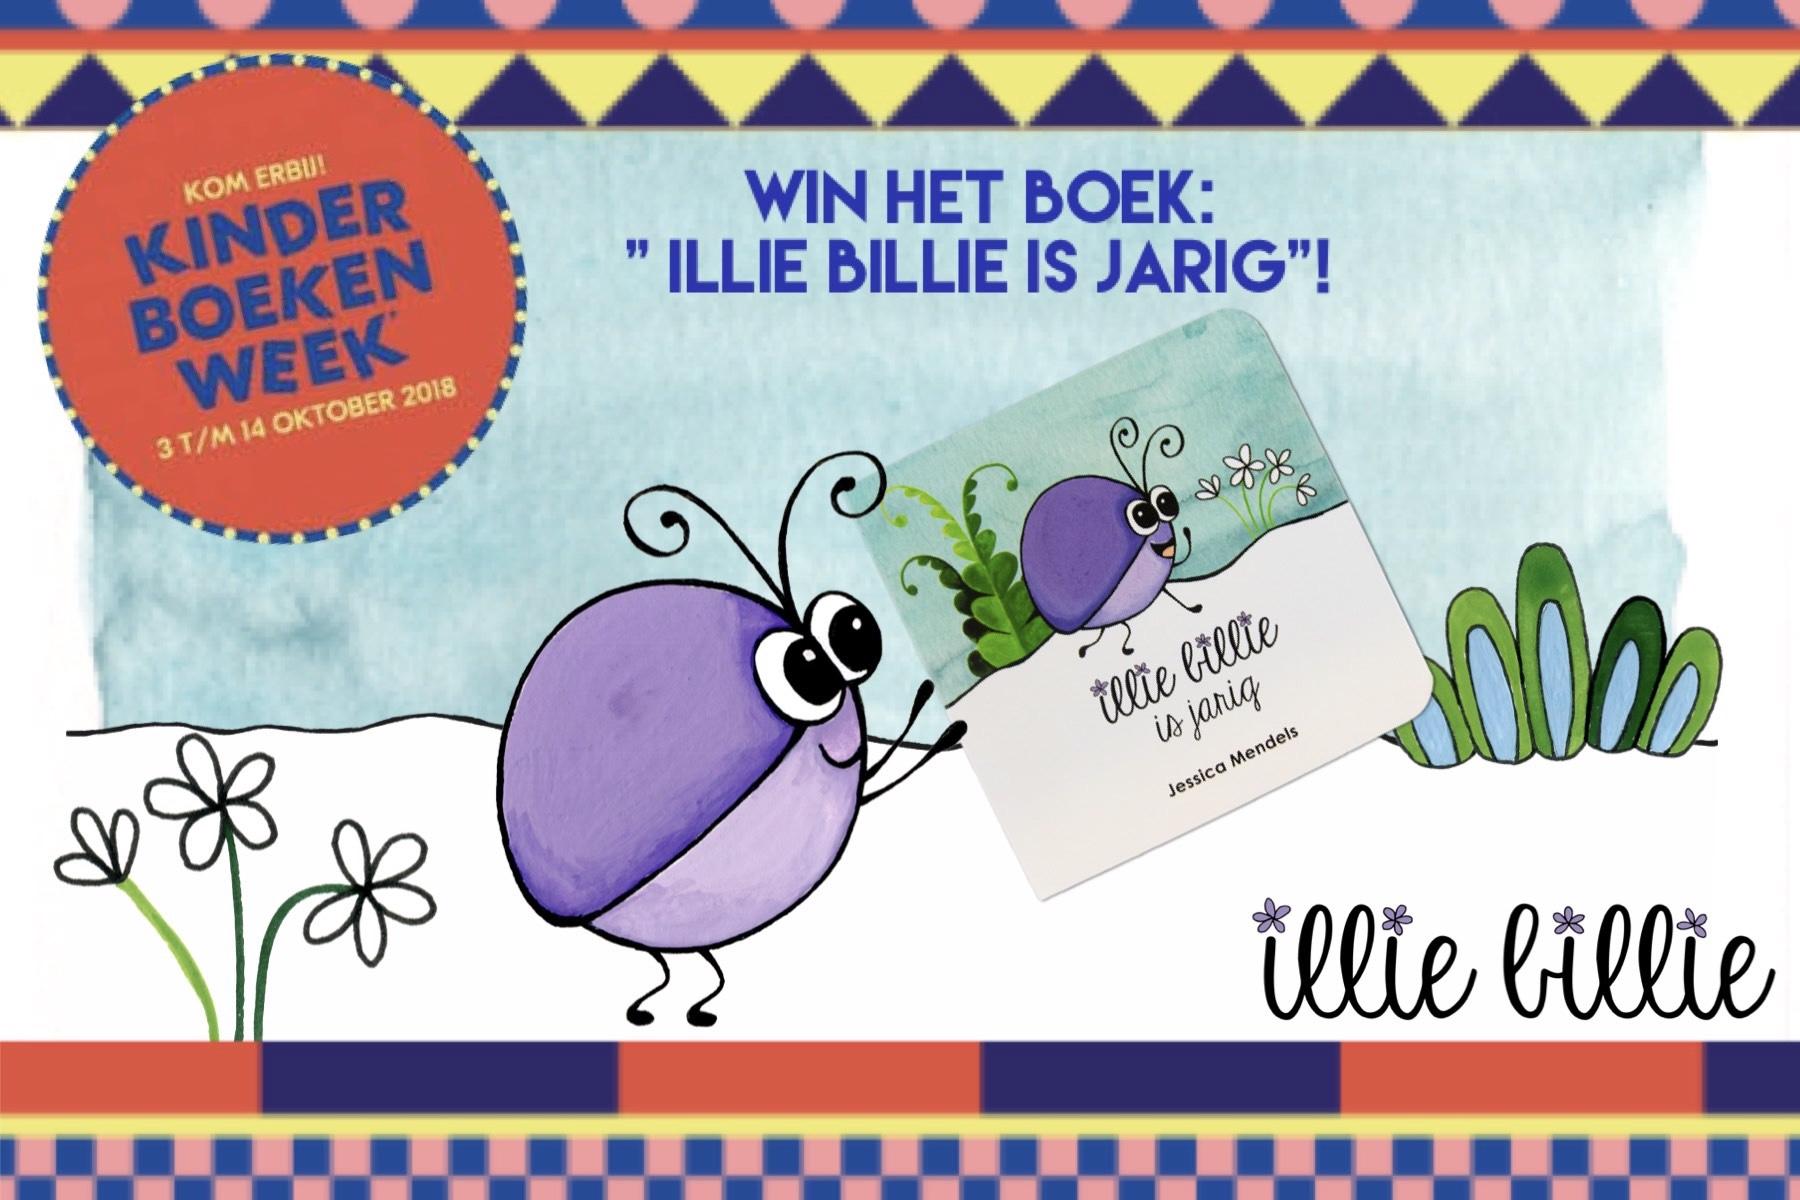 Winactie Illie Billie is jarig